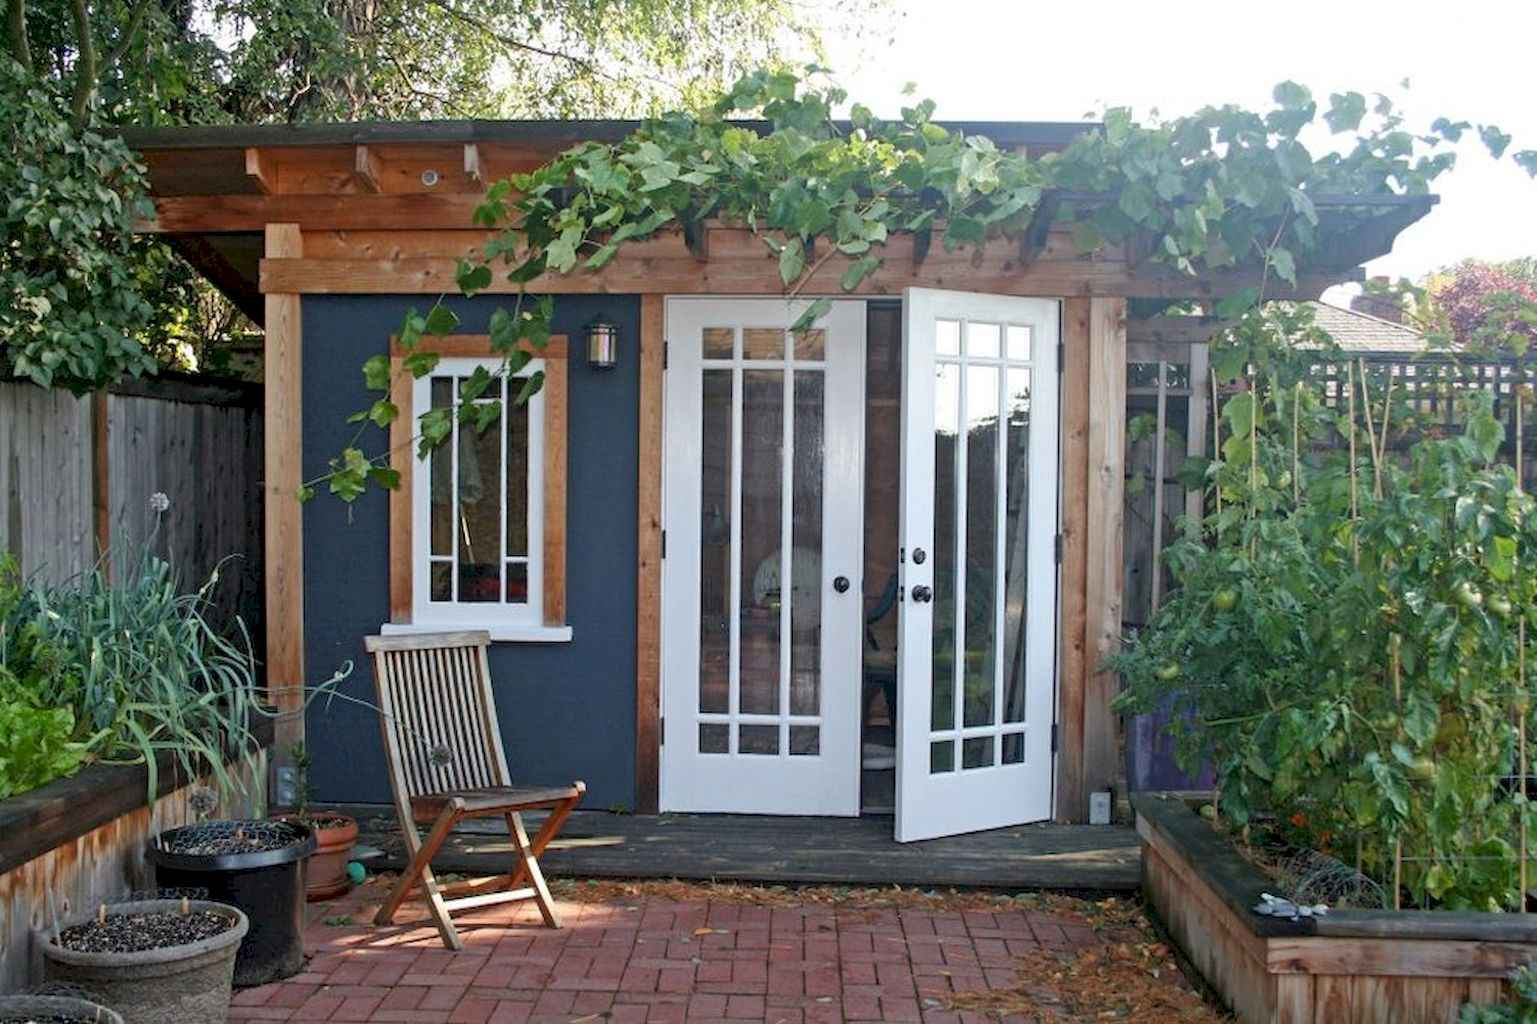 Cool diy backyard studio shed remodel design & decor ideas (3)